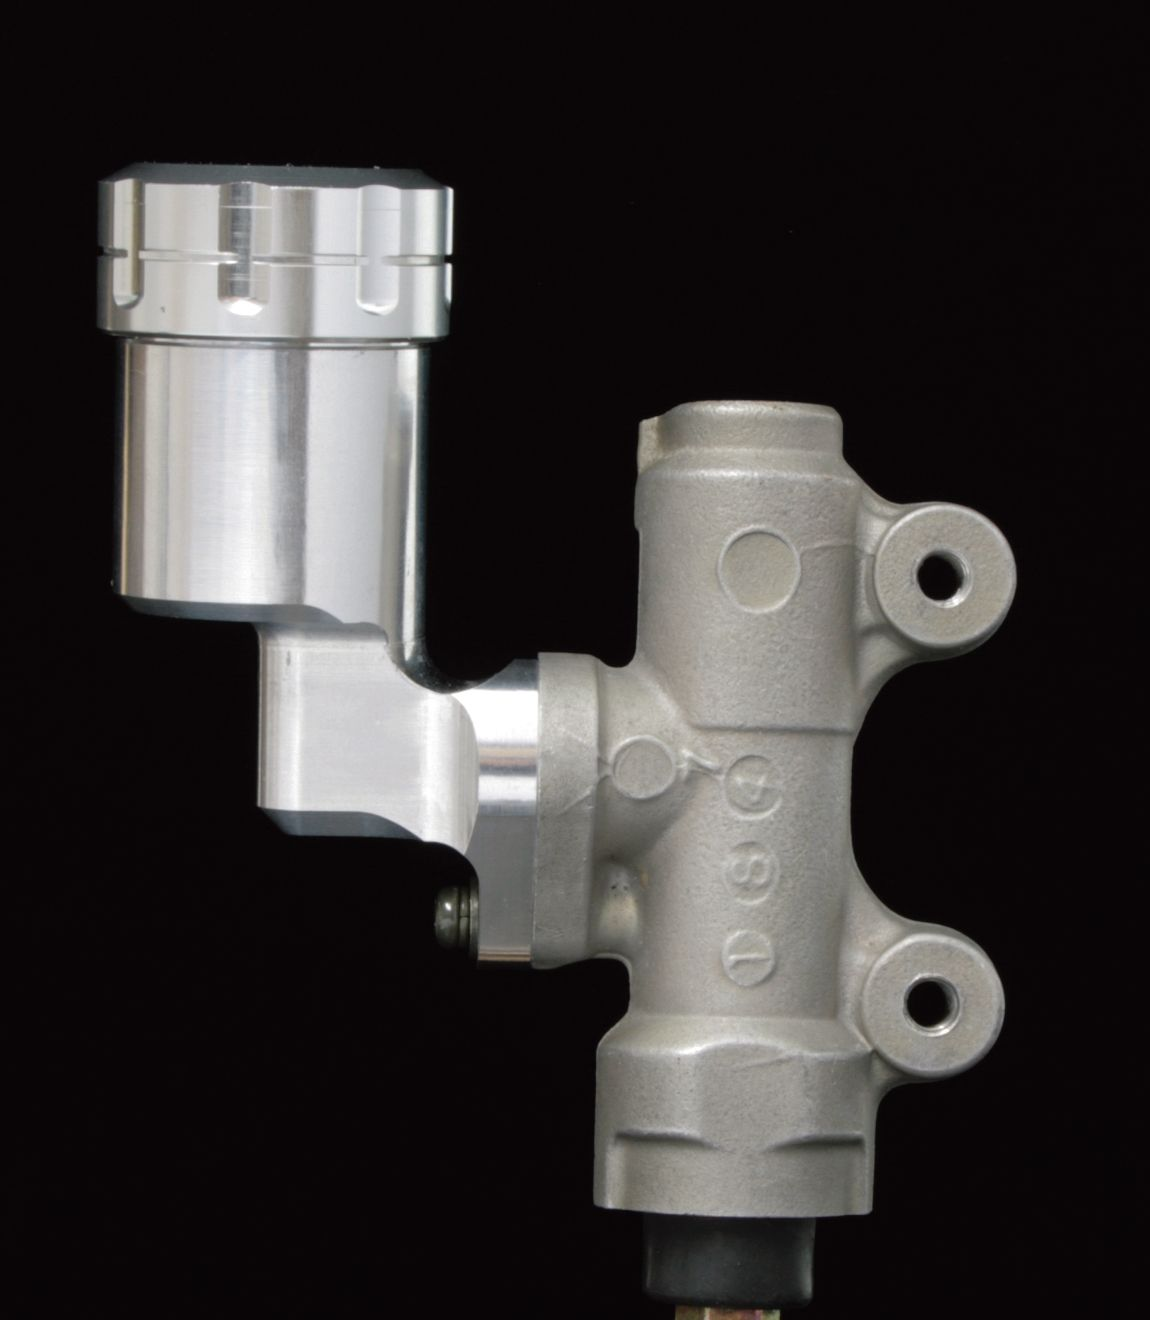 【G-Craft】煞車油壺改裝套件Type2 (圓型) - 「Webike-摩托百貨」